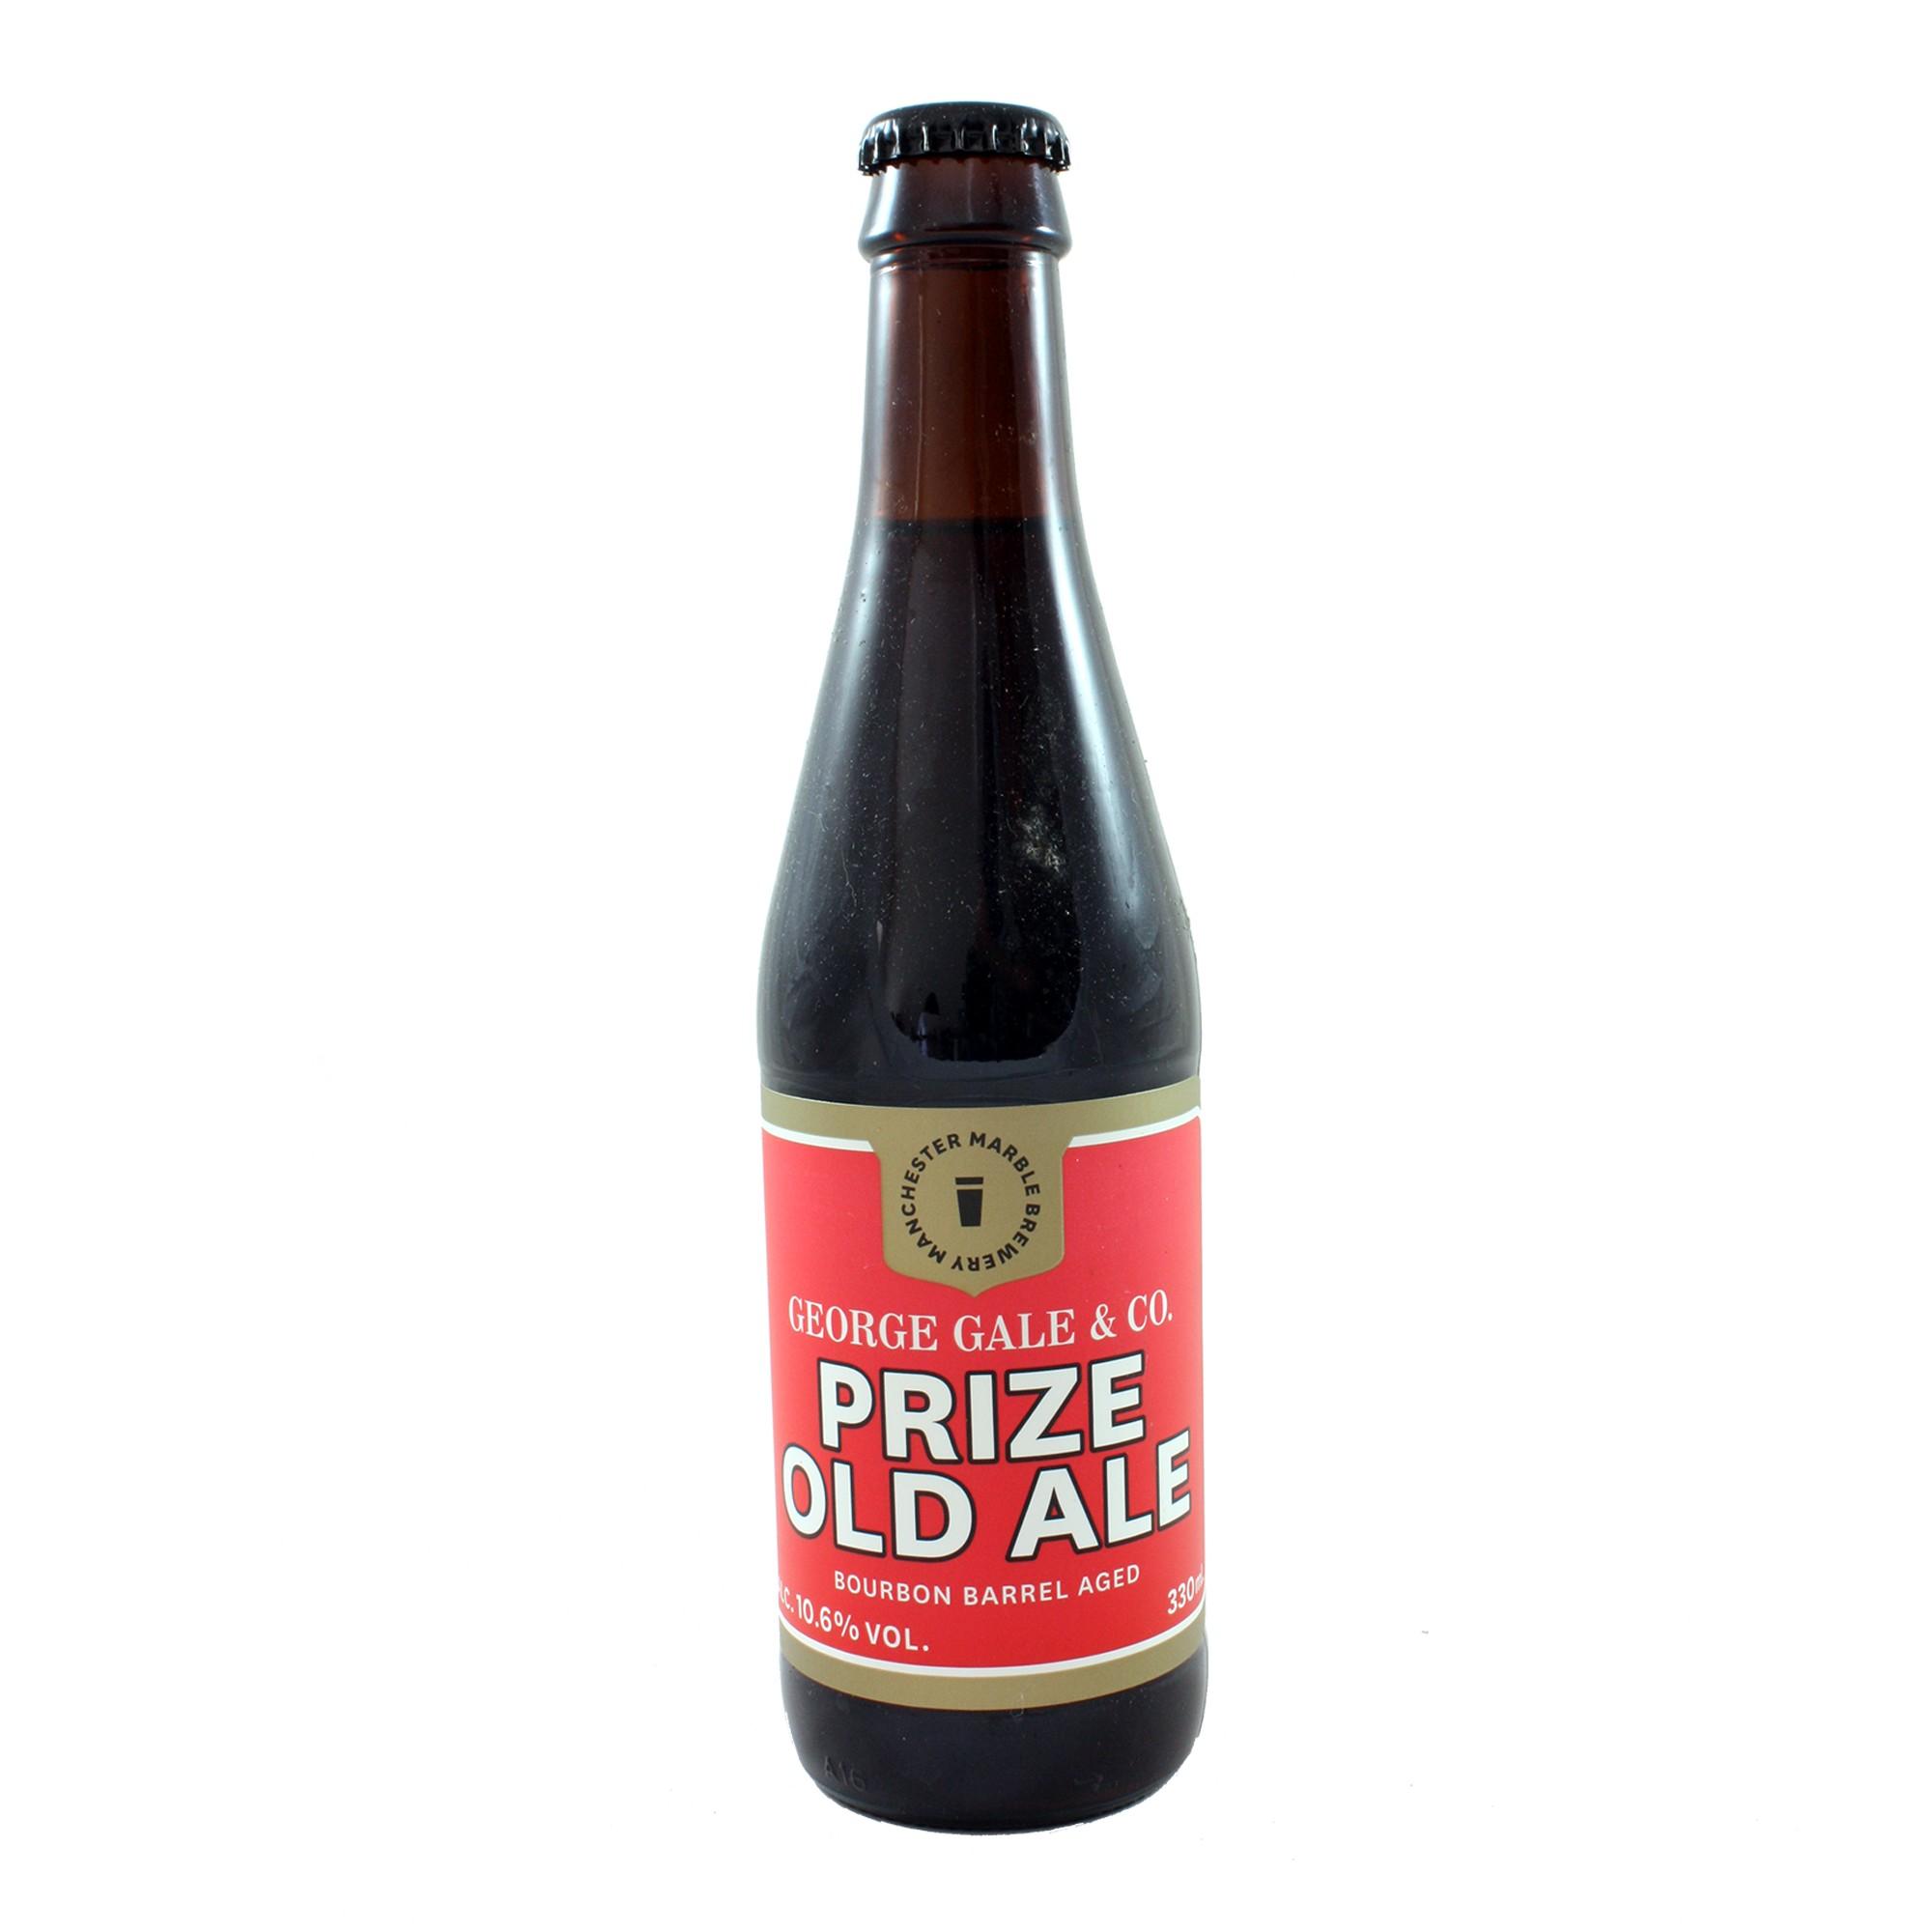 Gale's Prize Old Ale Bourbon Barrel Aged 33 cl